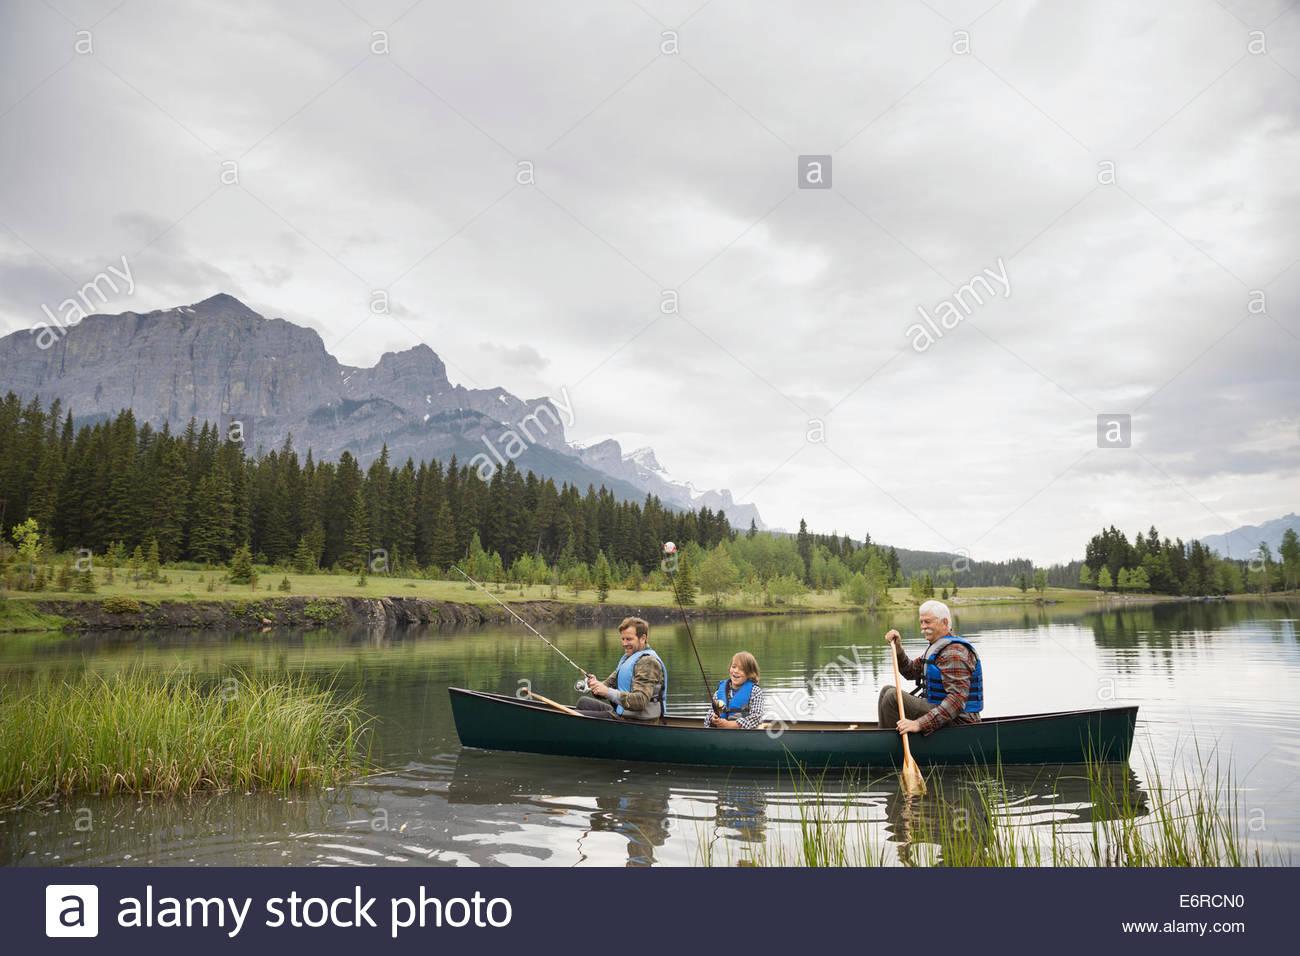 Three generations of men fishing in lake - Stock Image